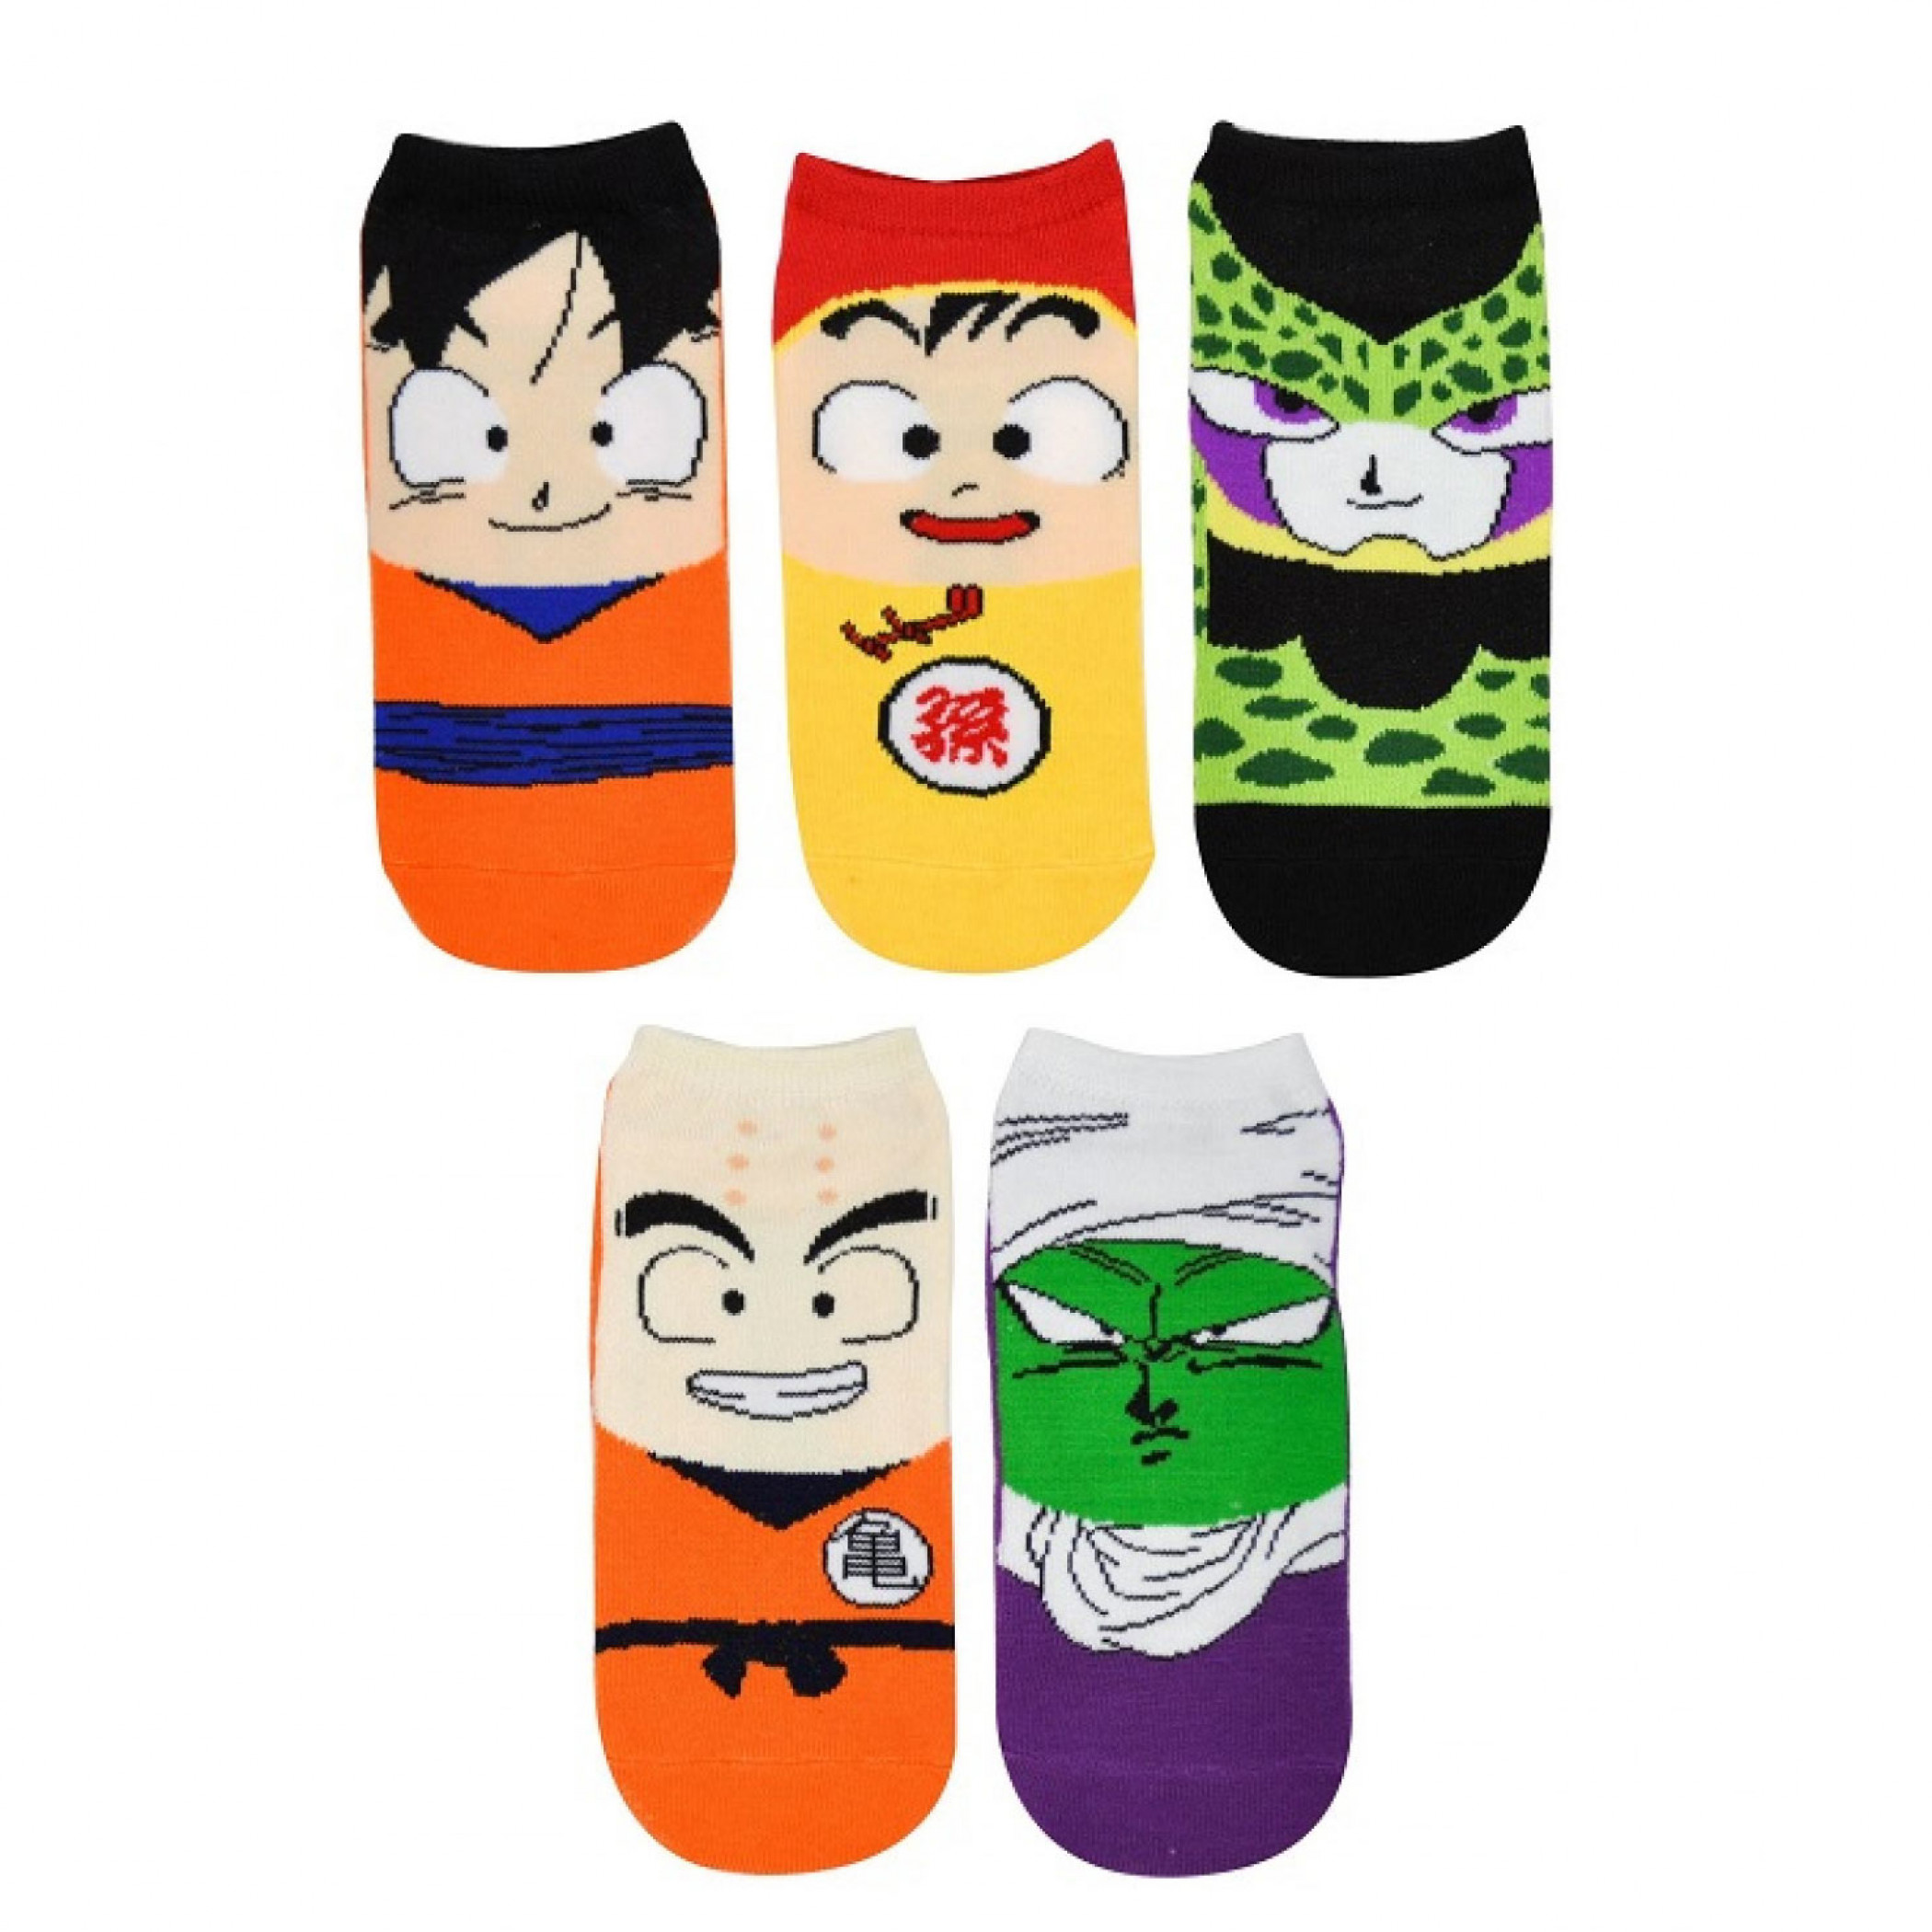 Dragon Ball Z Chibi 5-Pair Pack of Low Cut Socks